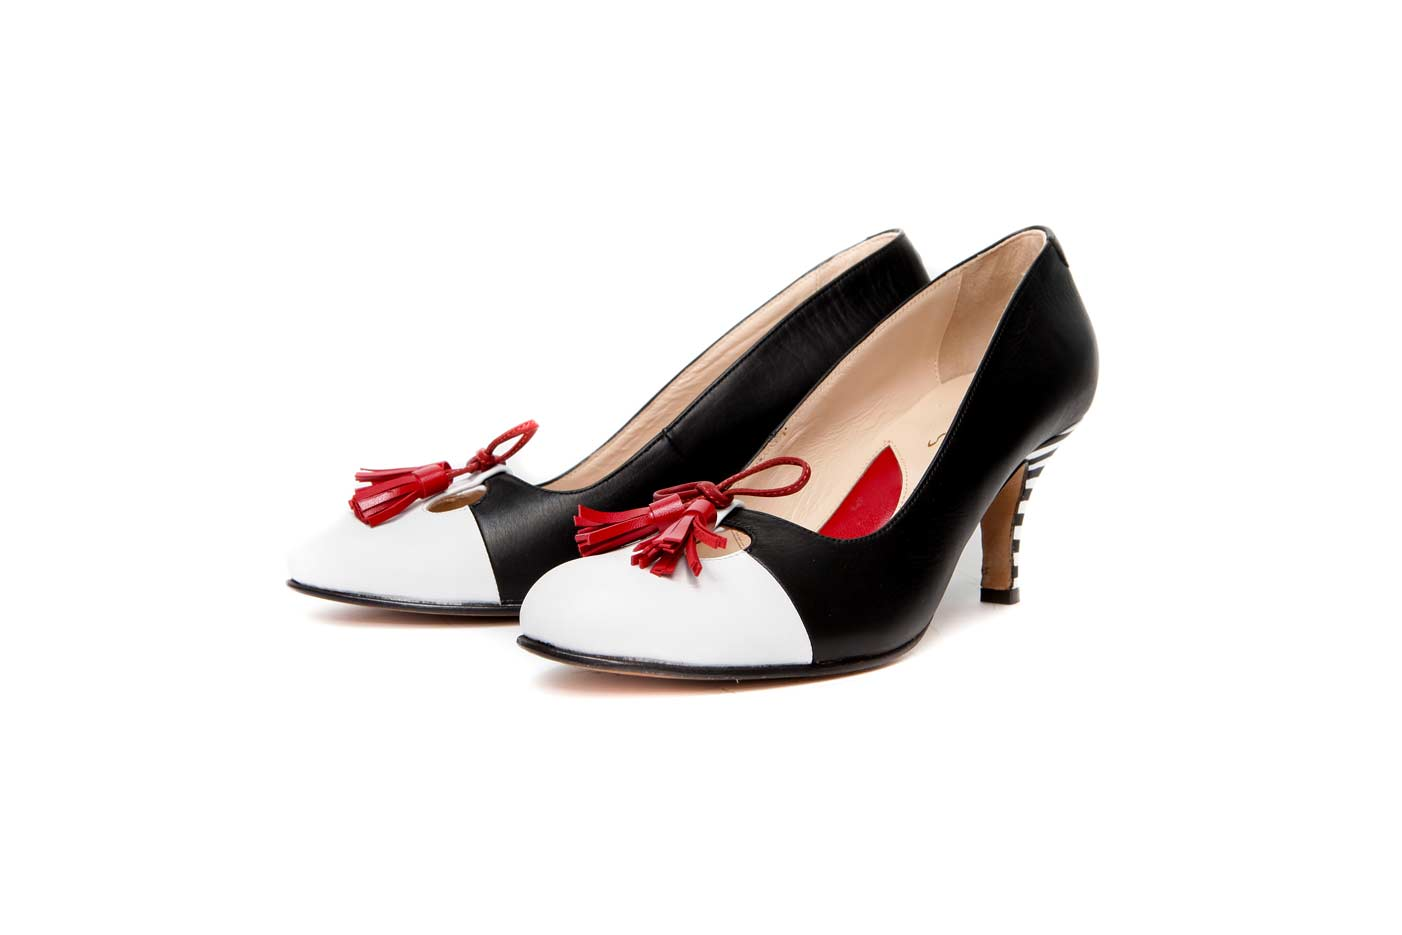 Black kitten heels | Handmade designer